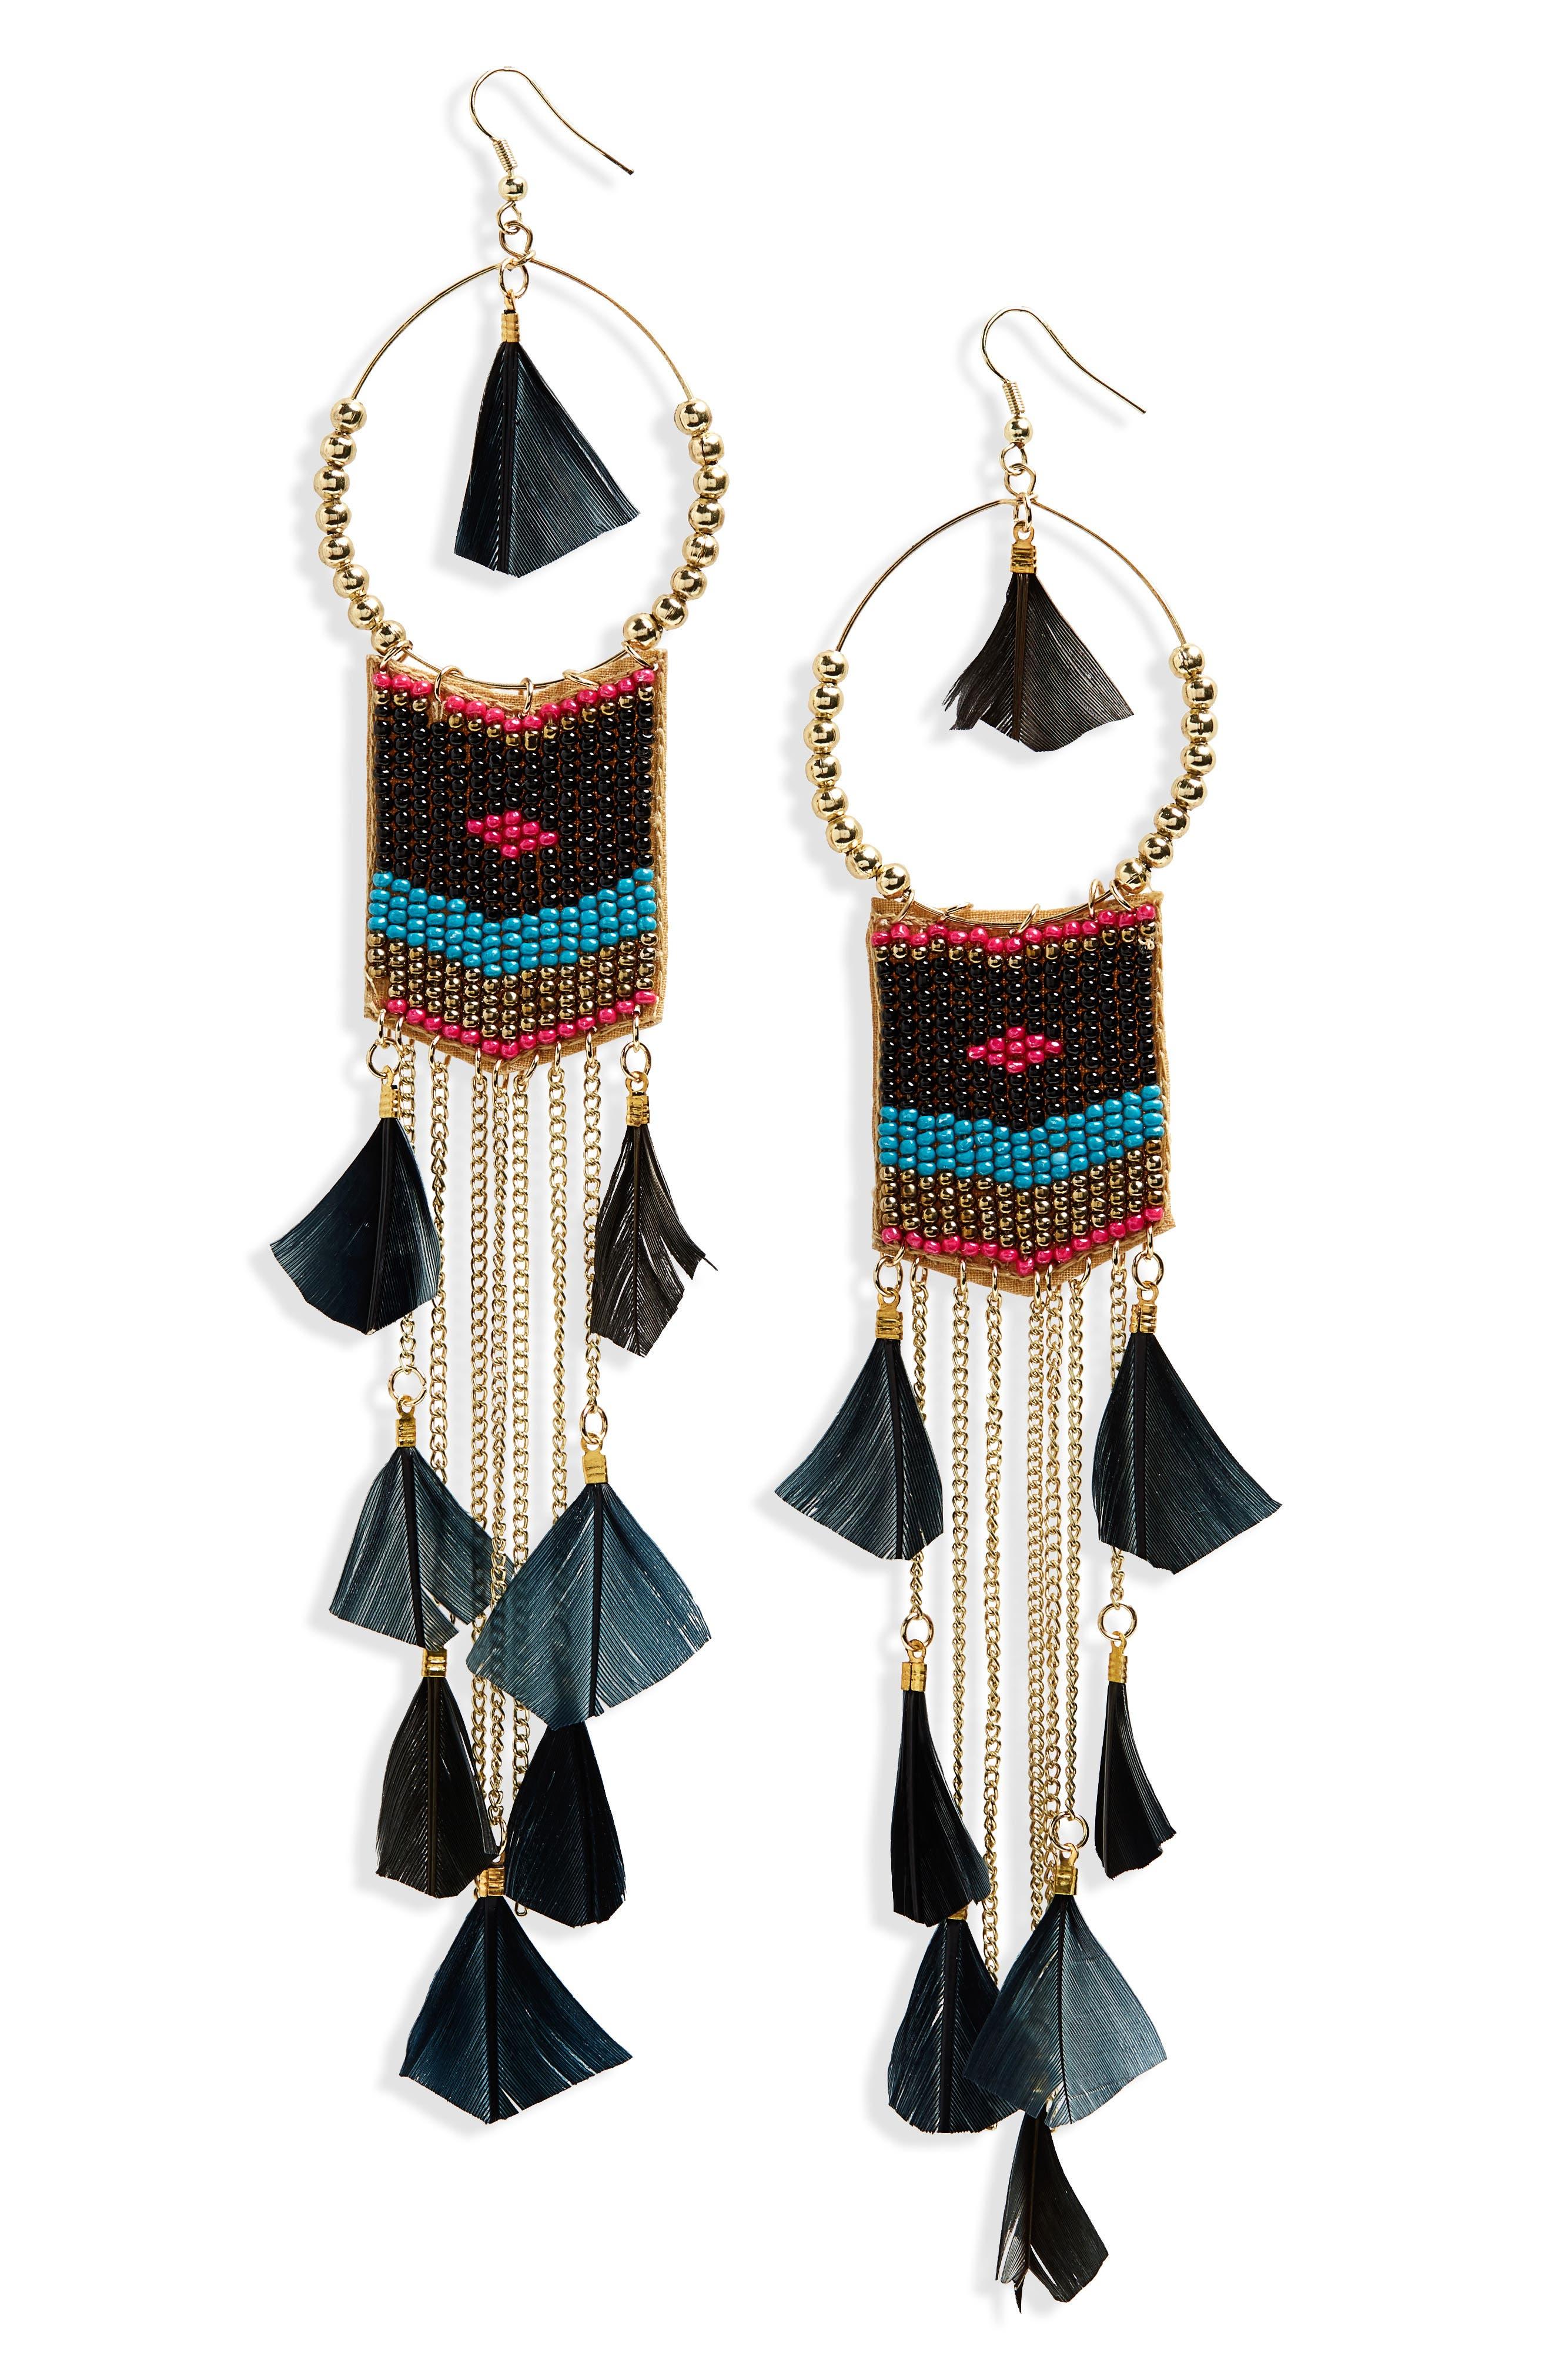 Feather Beaded Drop Earrings,                             Main thumbnail 1, color,                             BLACK/ MULTI